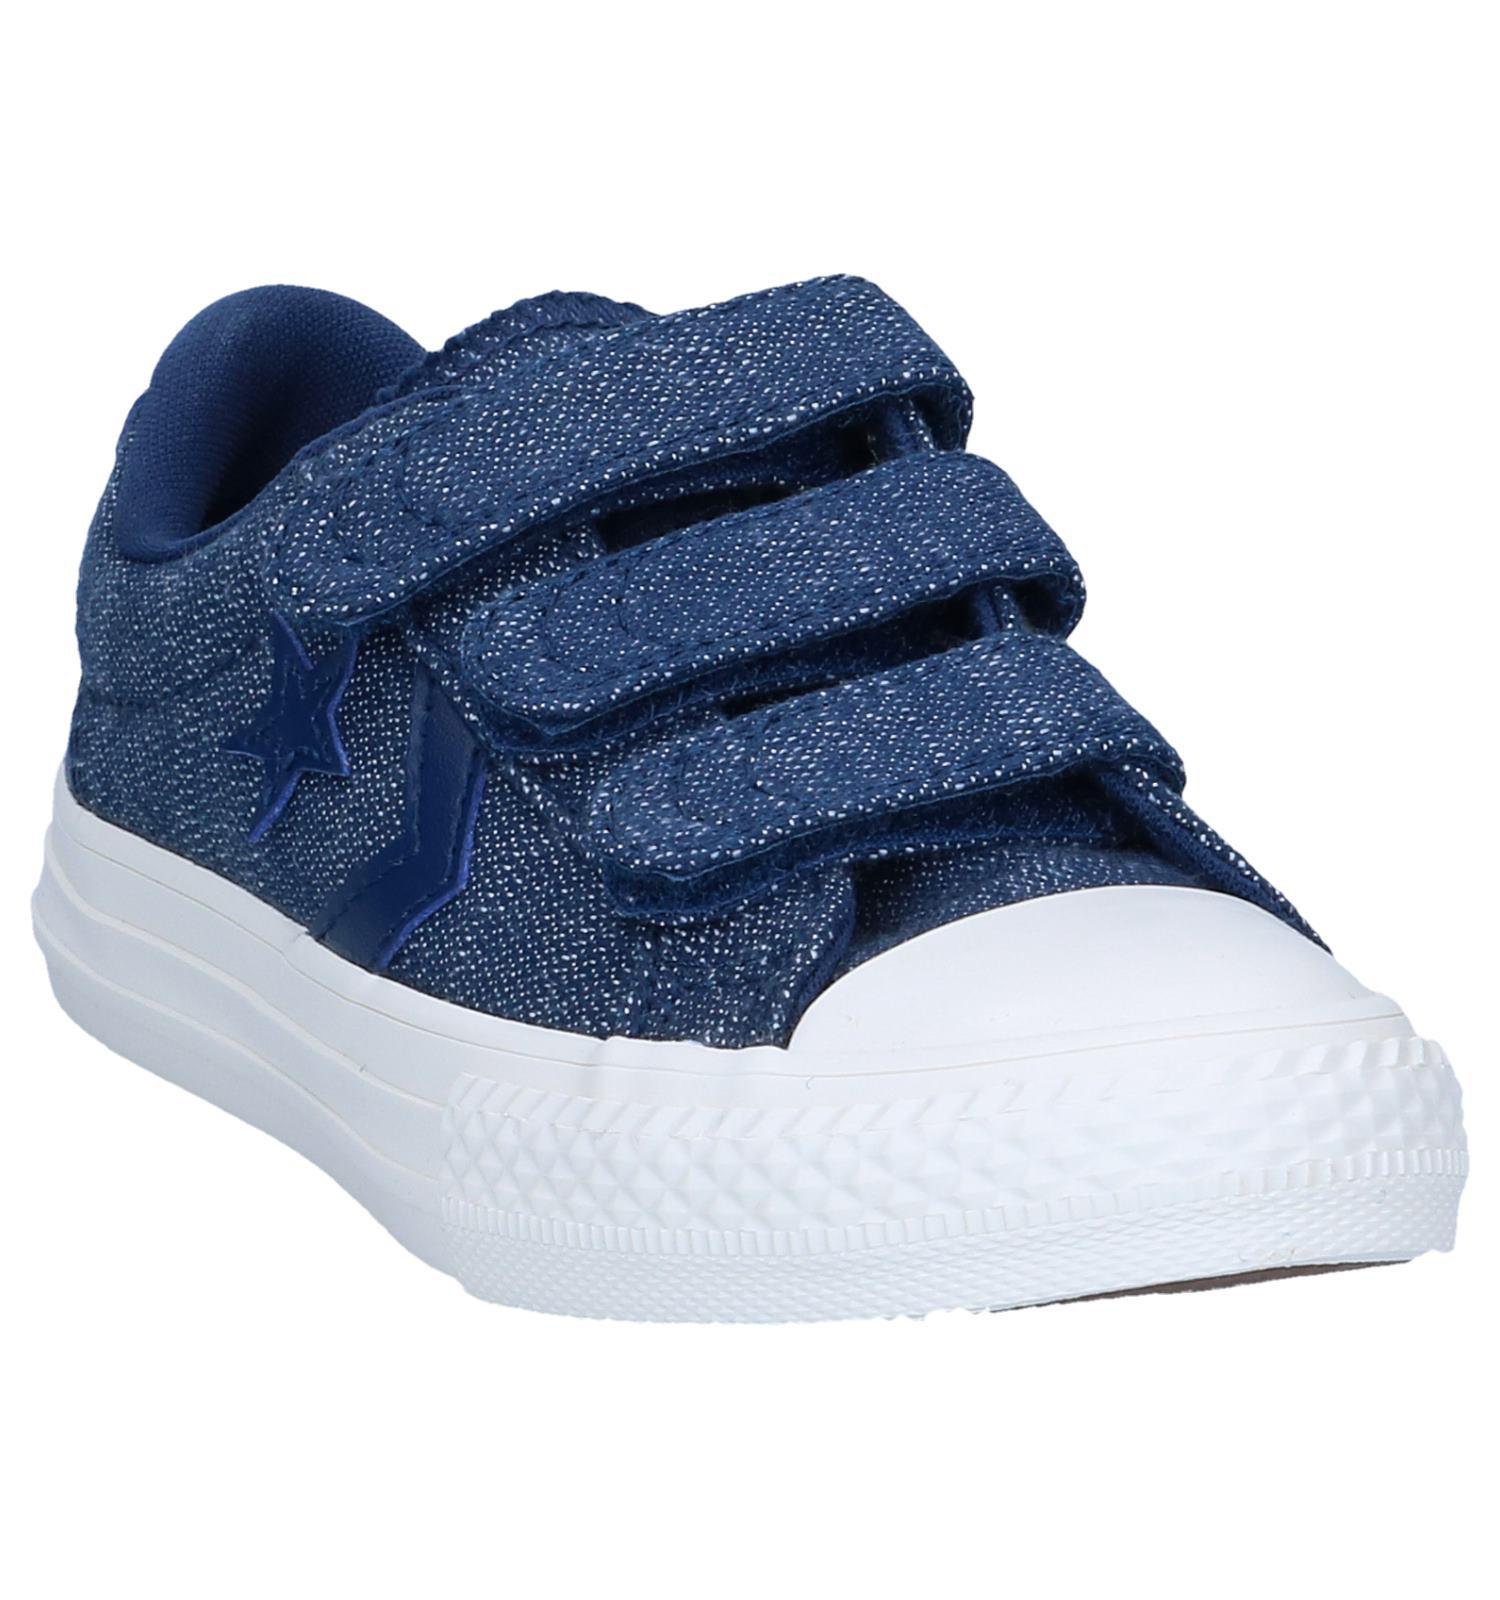 dac4dbffb91 Donkerblauwe Sneakers Converse Star Player 3V OX | SCHOENENTORFS.NL |  Gratis verzend en retour